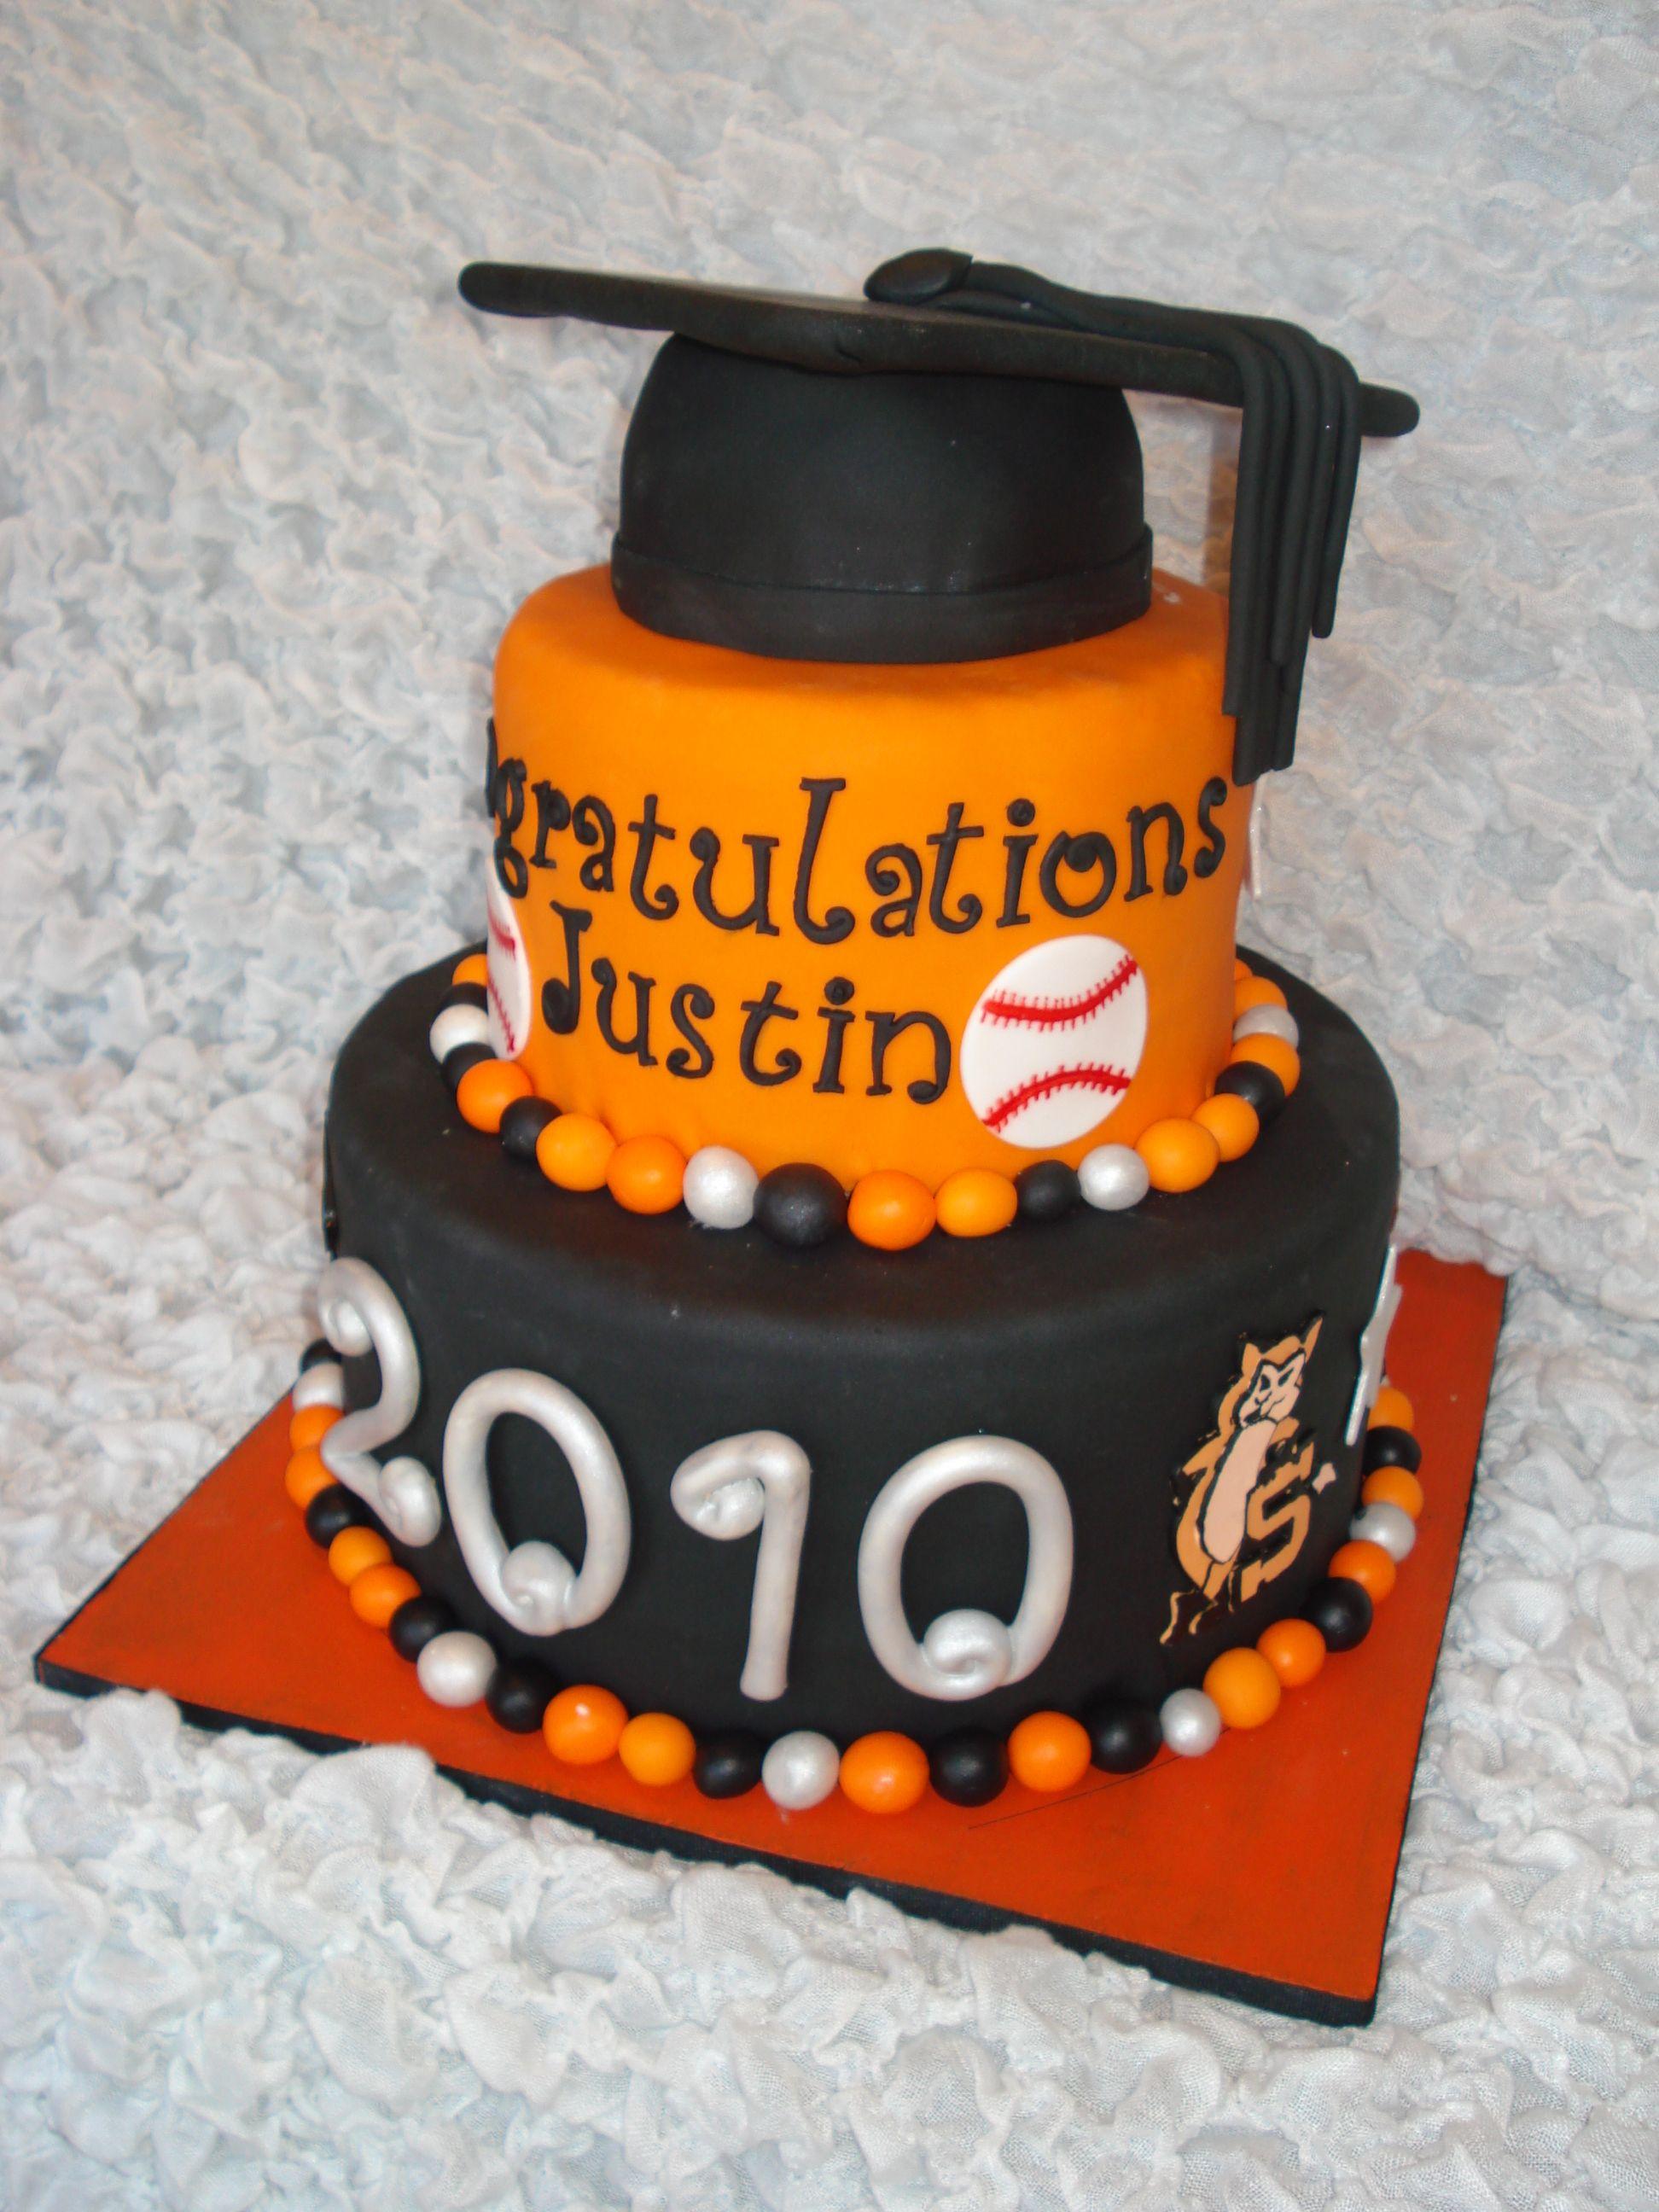 High School Graduation Cake This Cake Was For A Boy Graduating